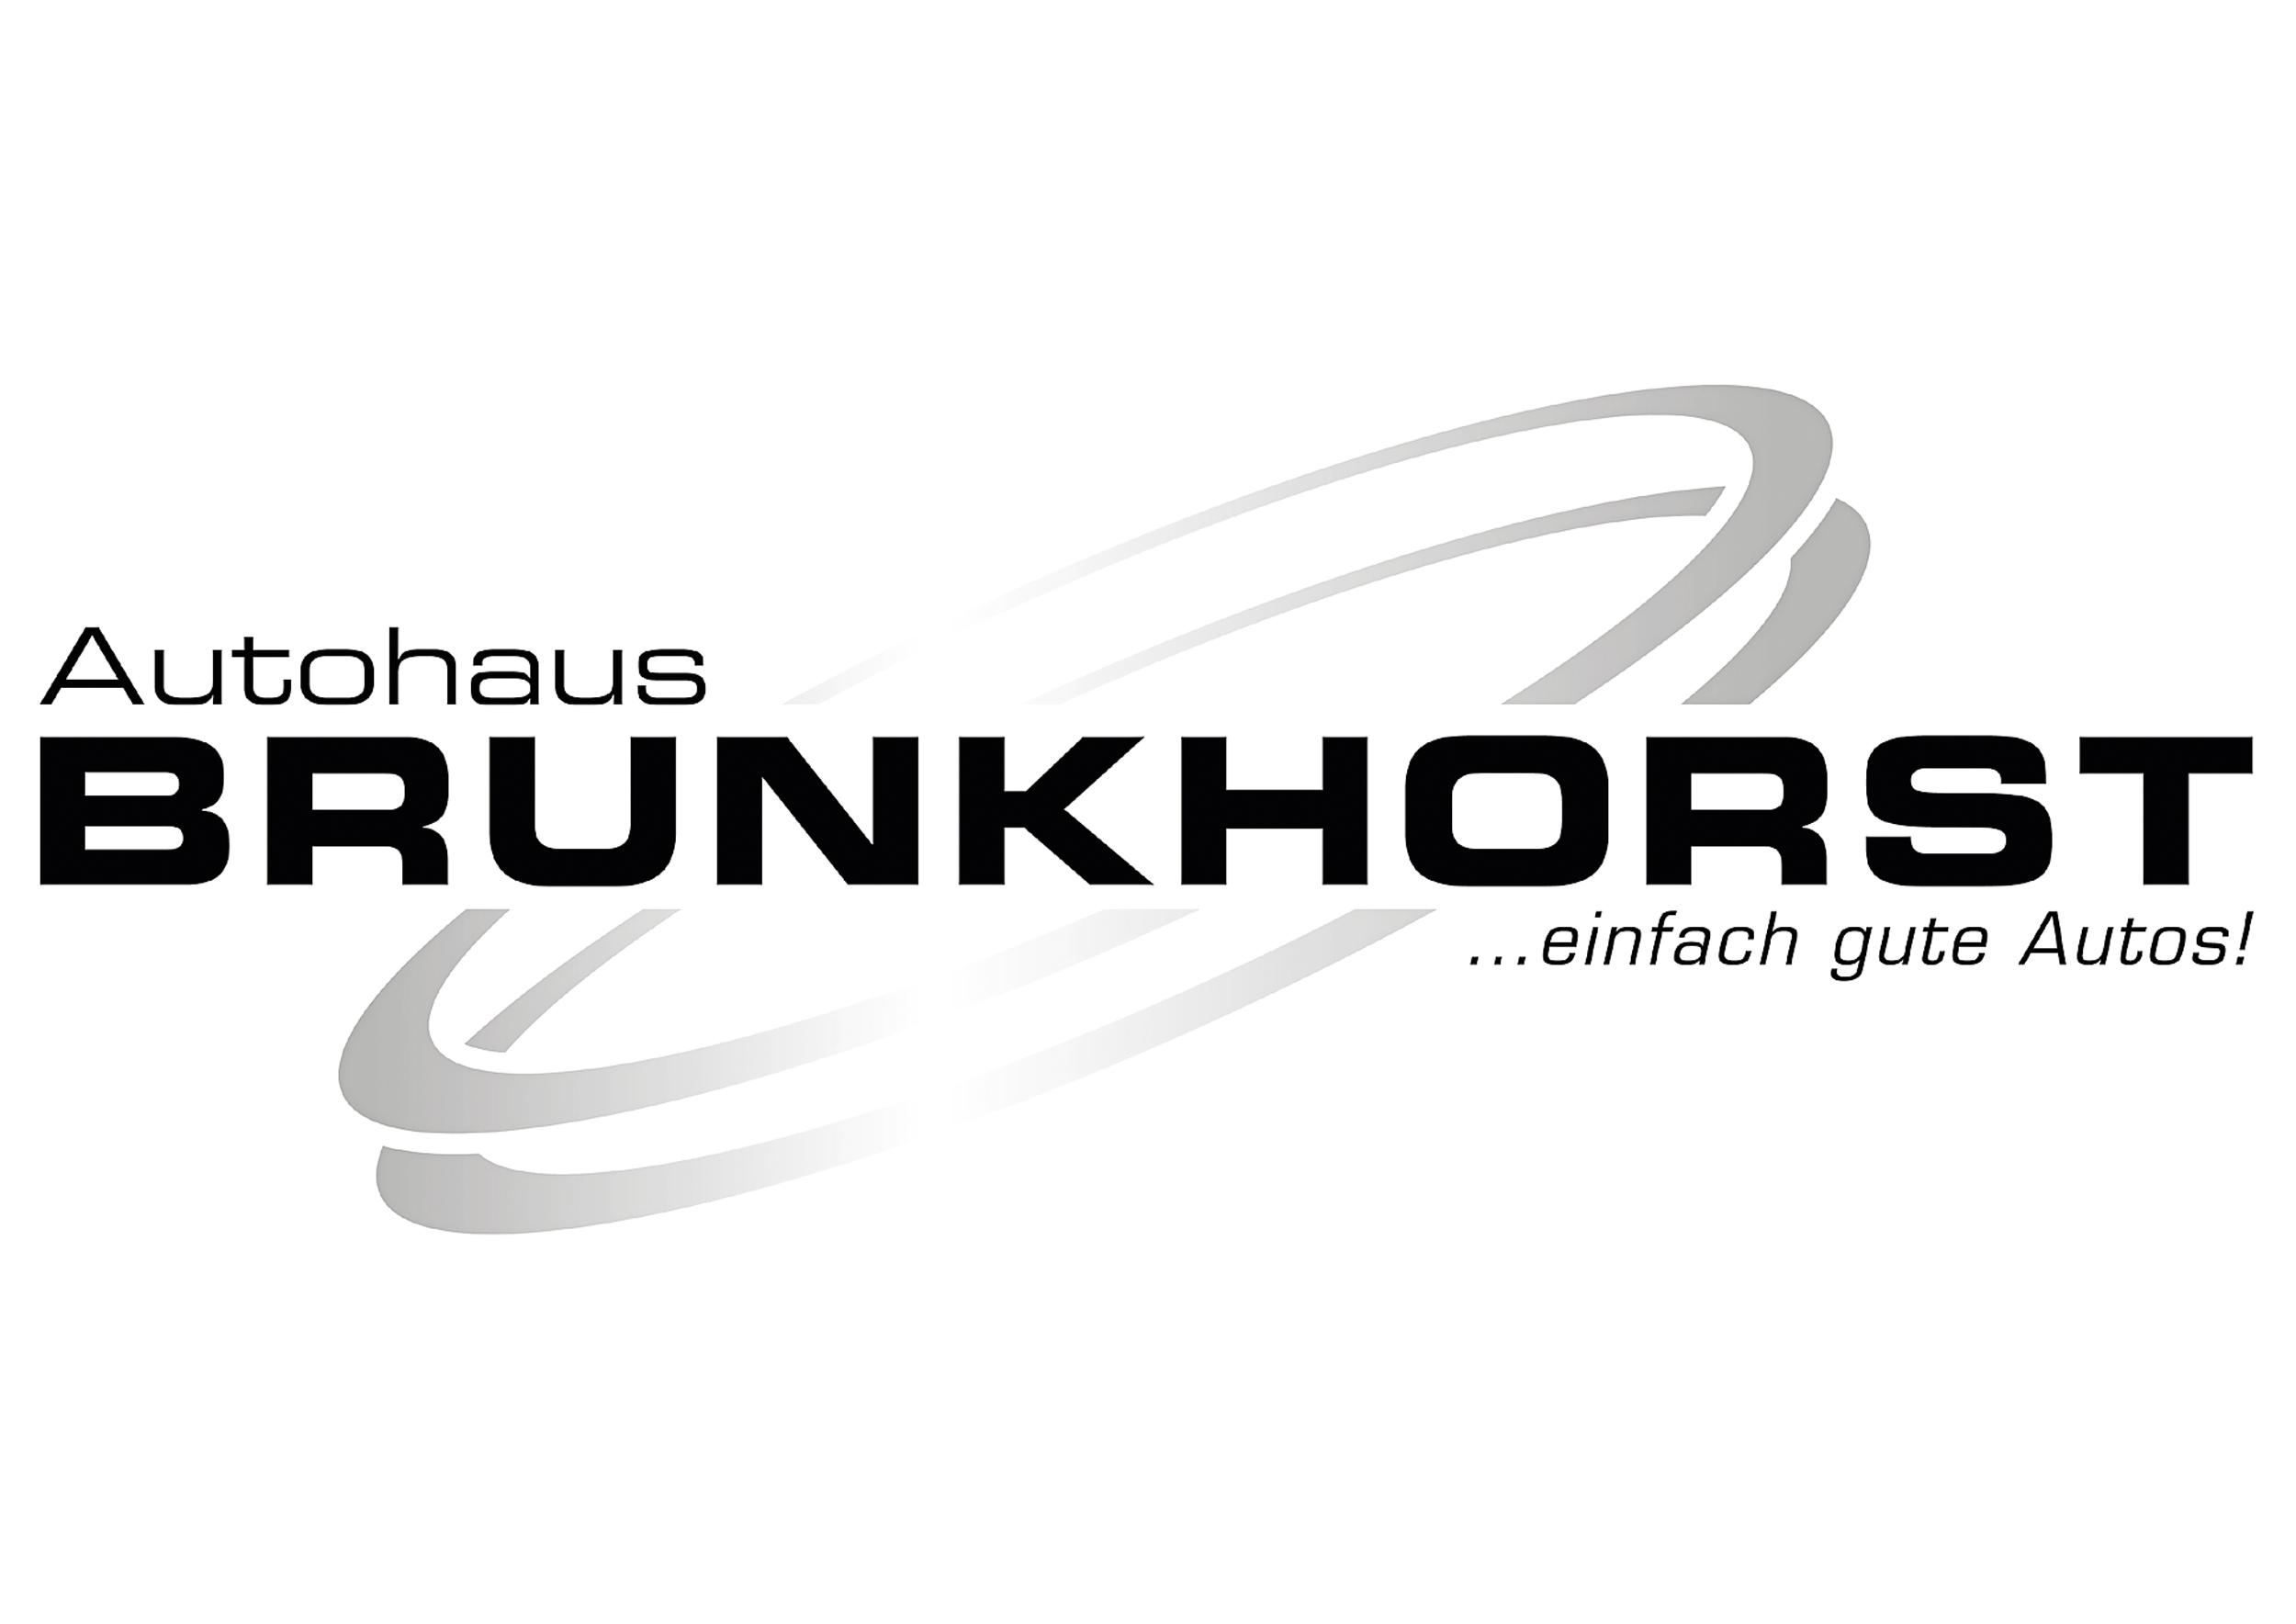 bzb_web_brunkhorst_logo_2500x1768.jpg